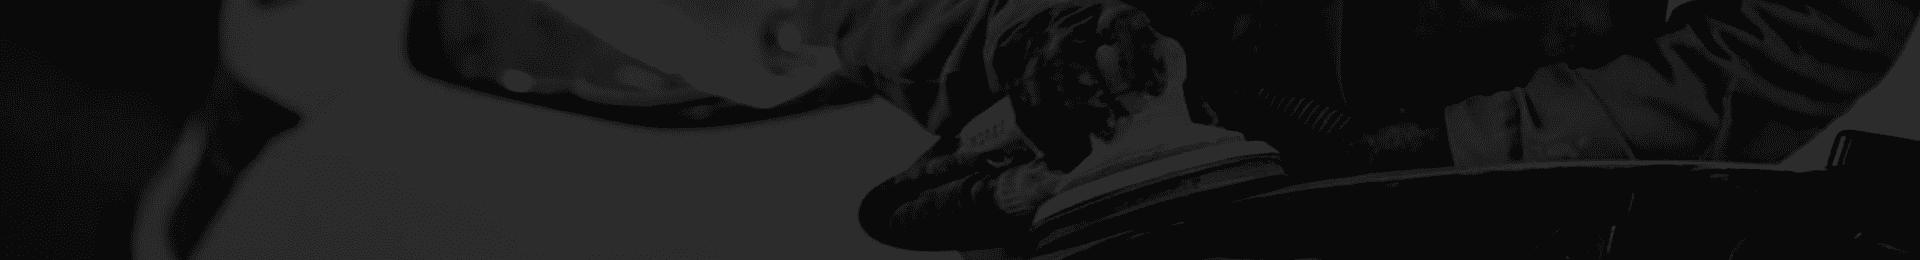 banner-revisao-desktop